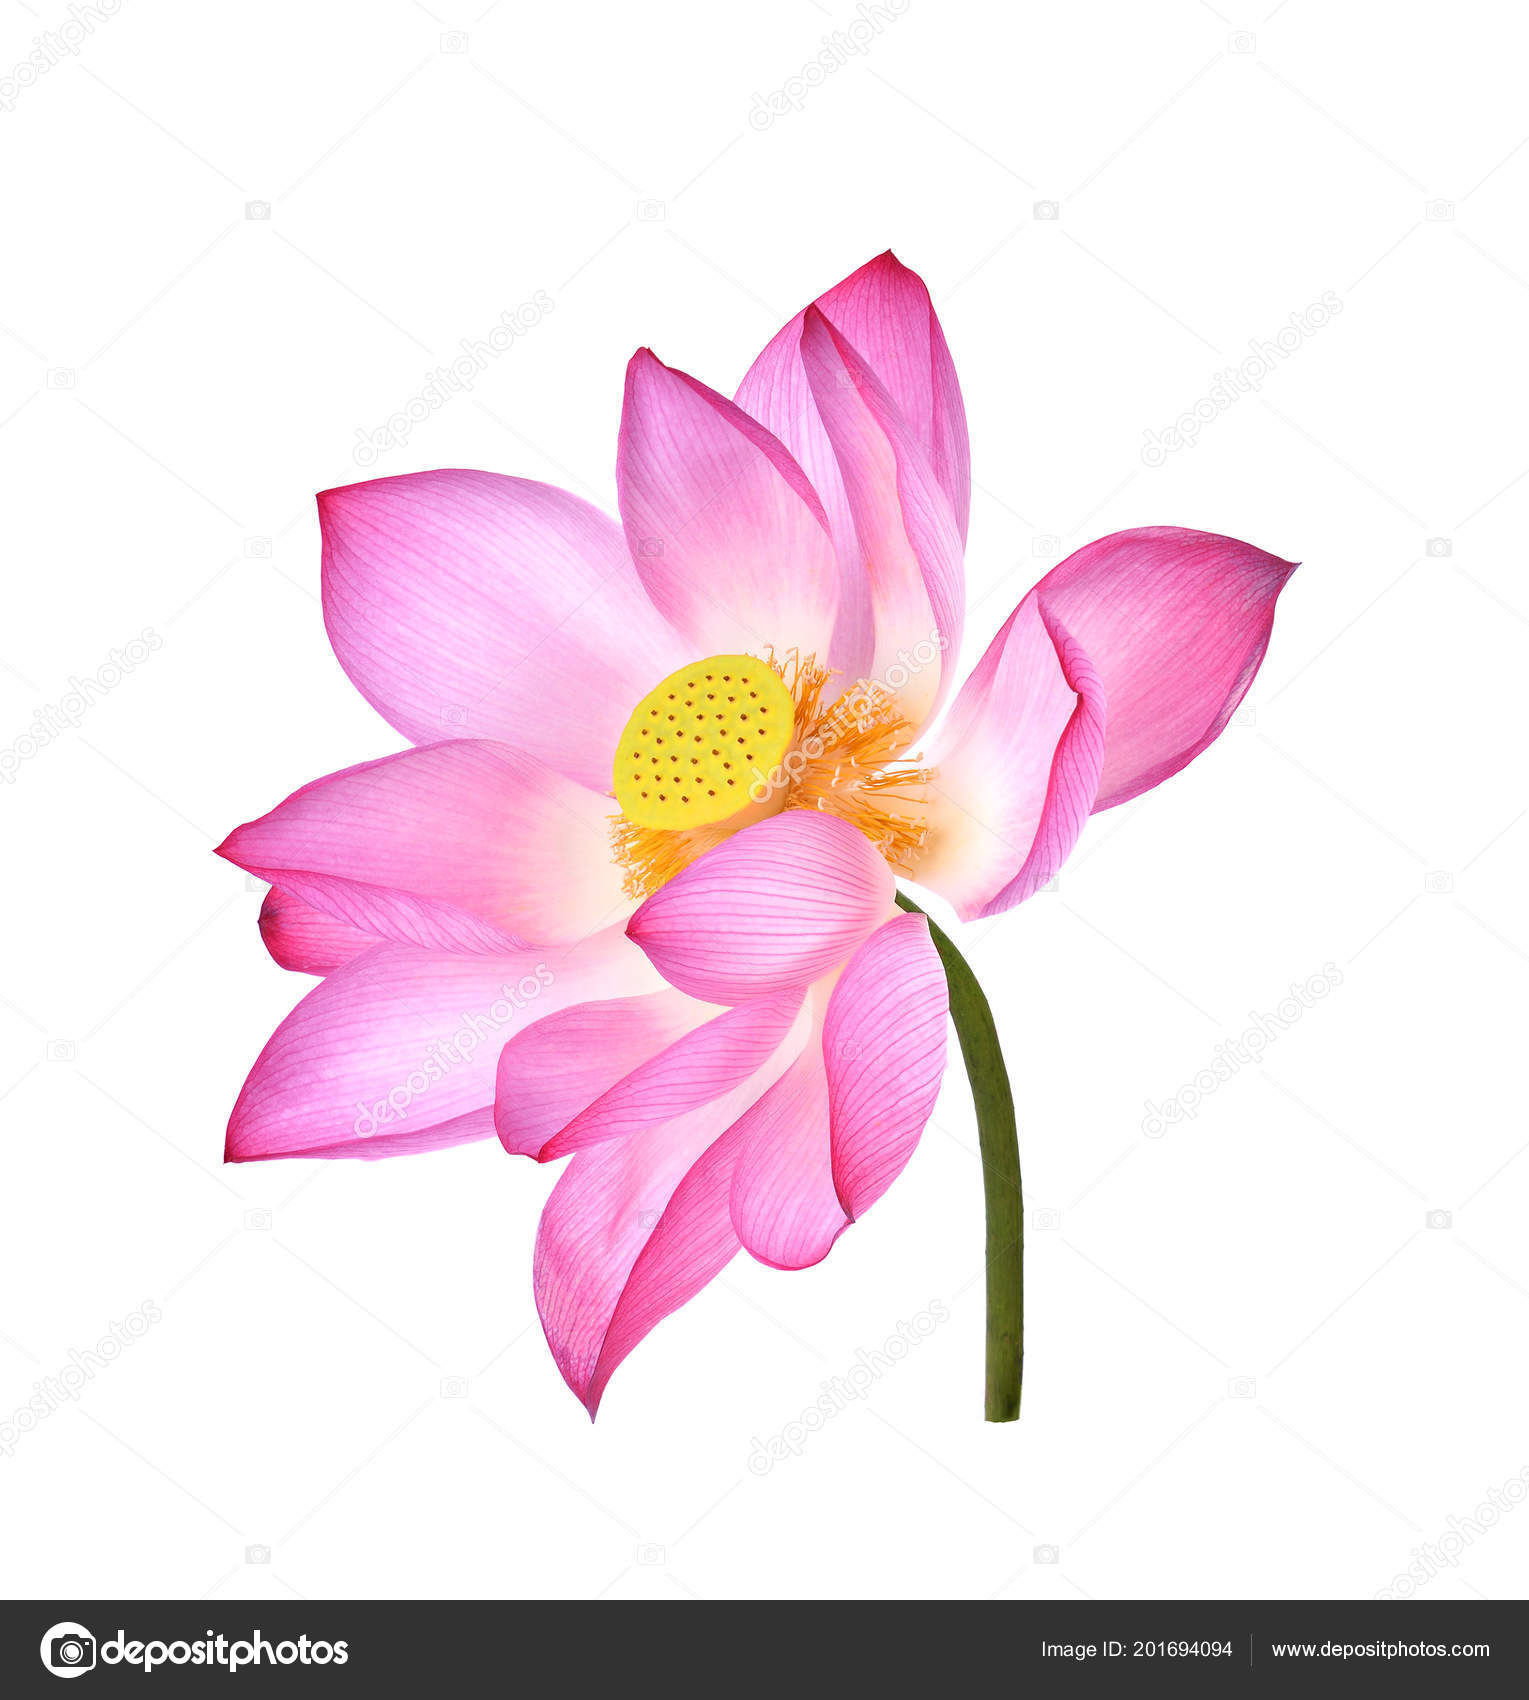 Lotus flower white background stock photo anatchantgmail lotus flower white background stock photo izmirmasajfo